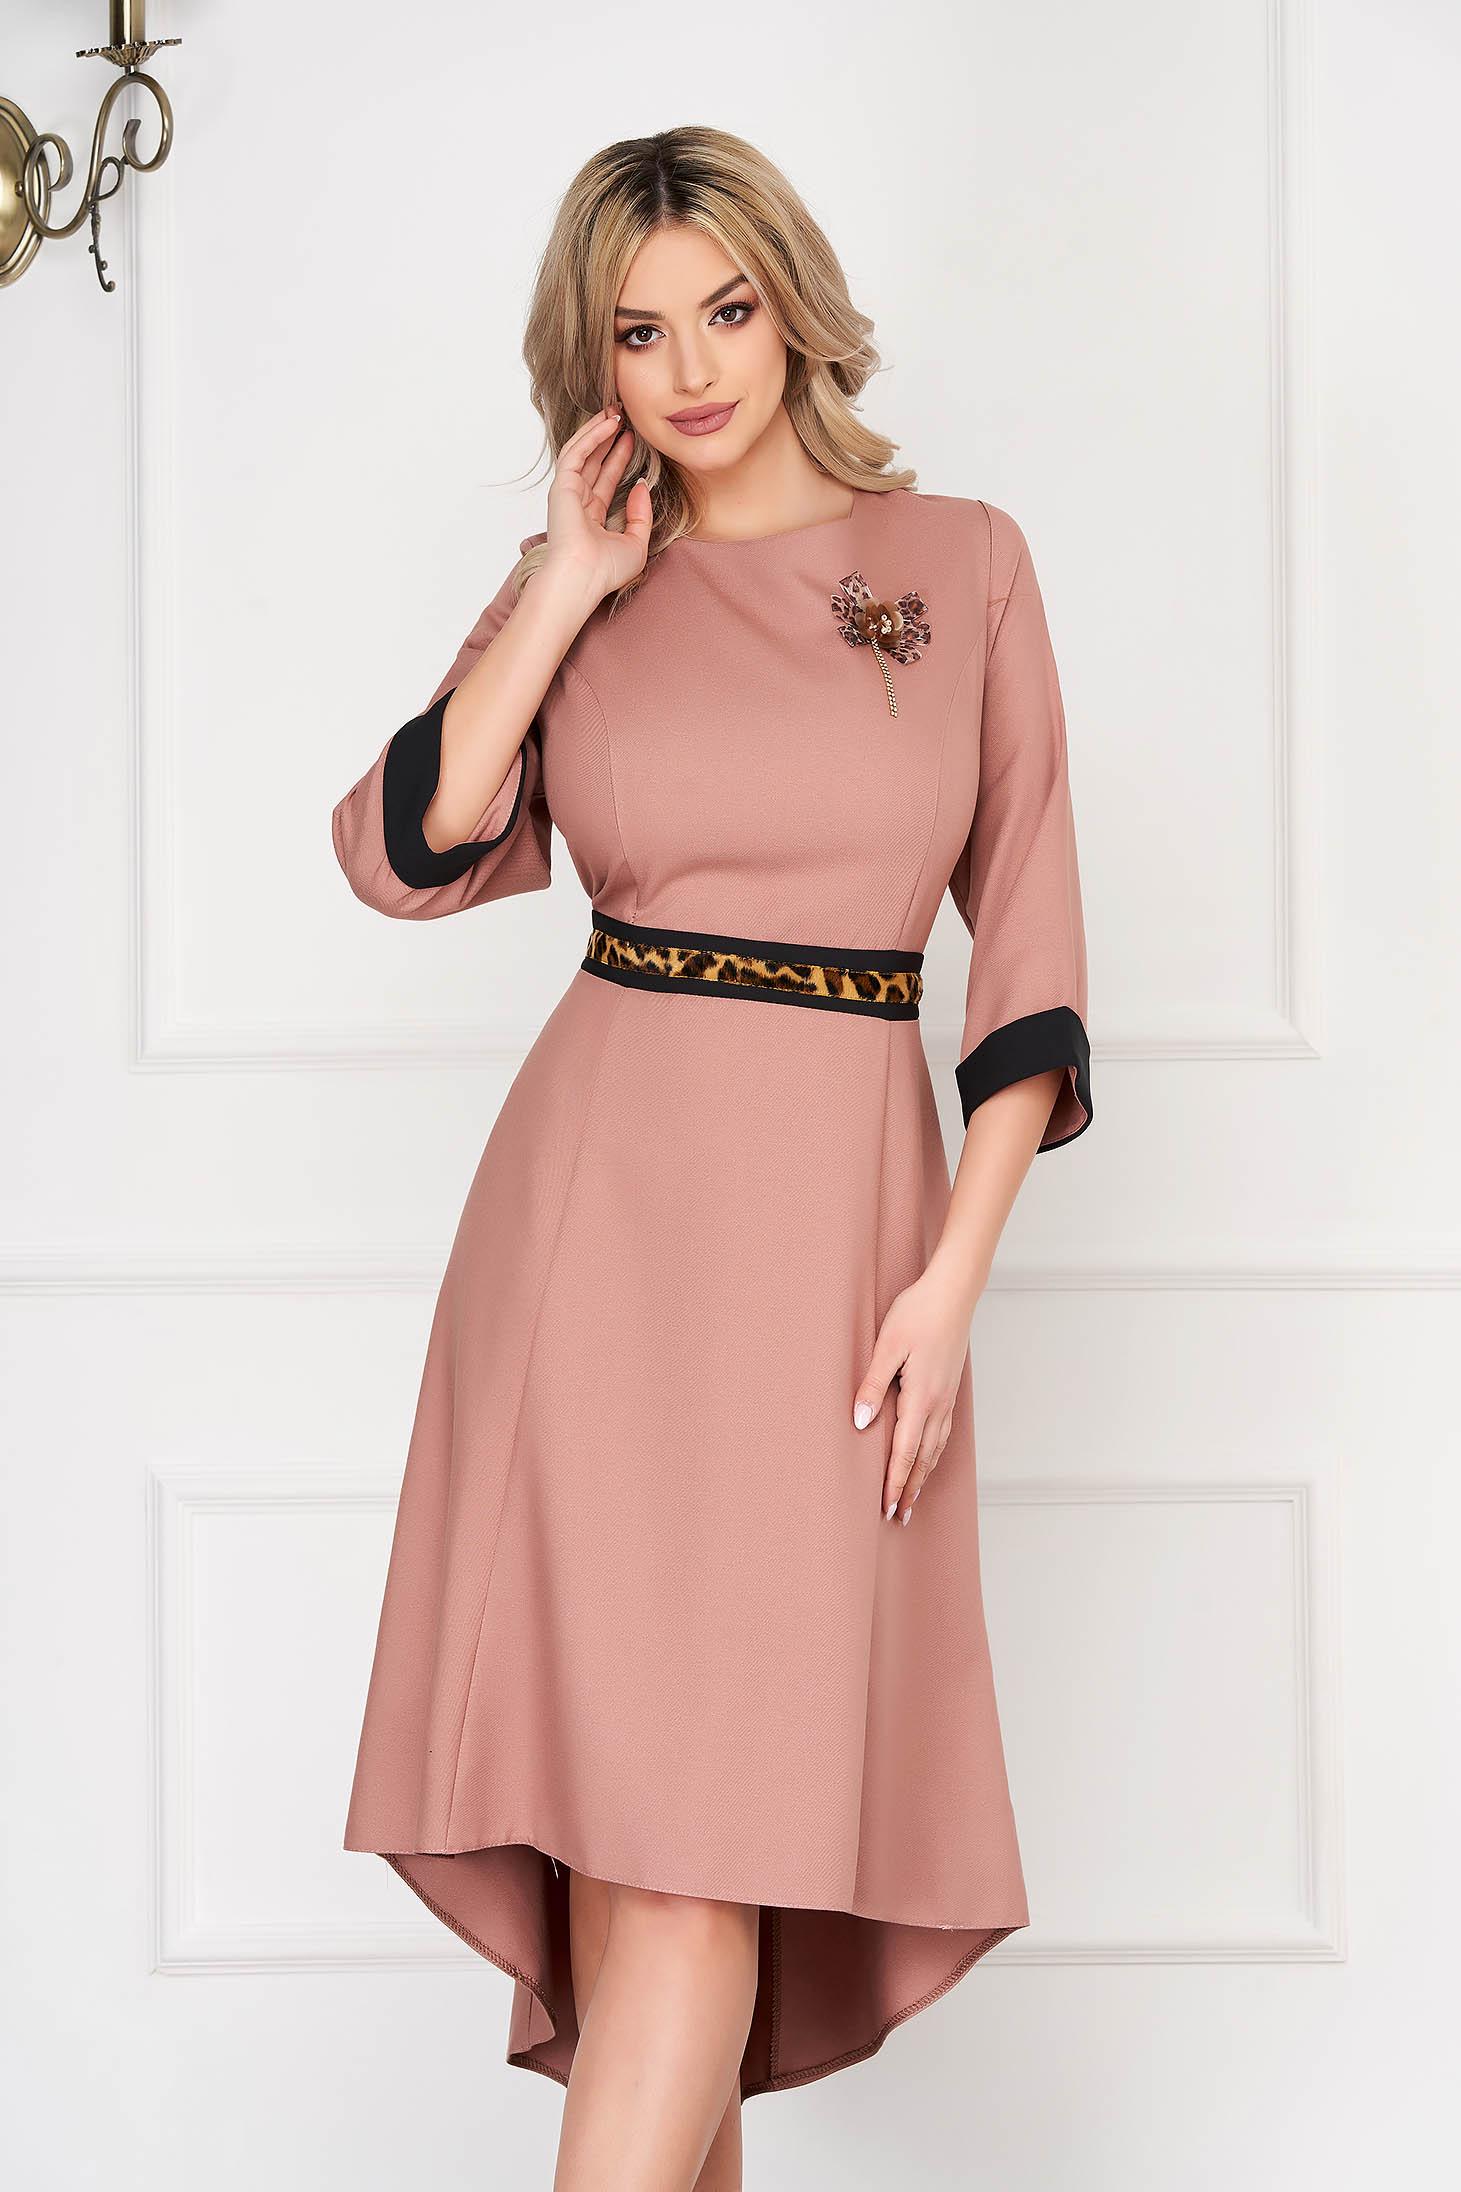 Rochie roz prafuit eleganta midi asimetrica in clos din stofa subtire accesorizata cu brosa